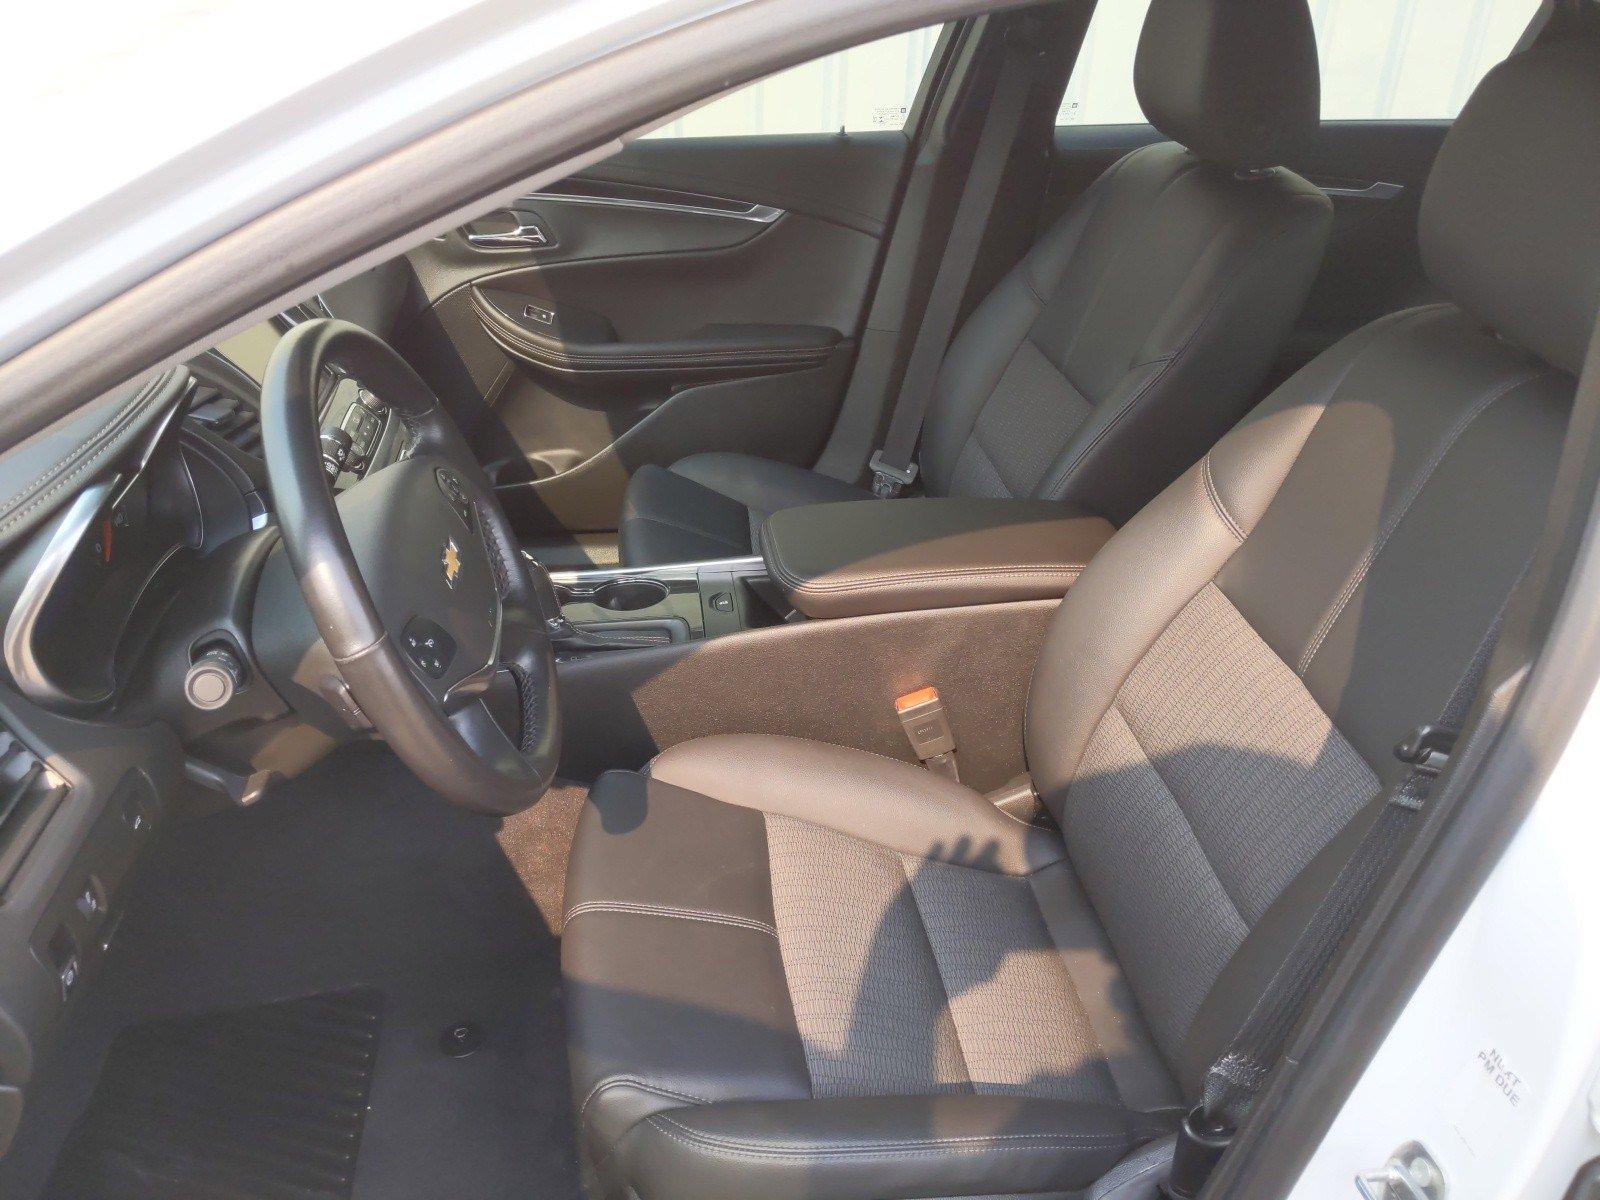 Used 2018 Chevrolet Impala LT 4dr Car for sale in Grand Island NE